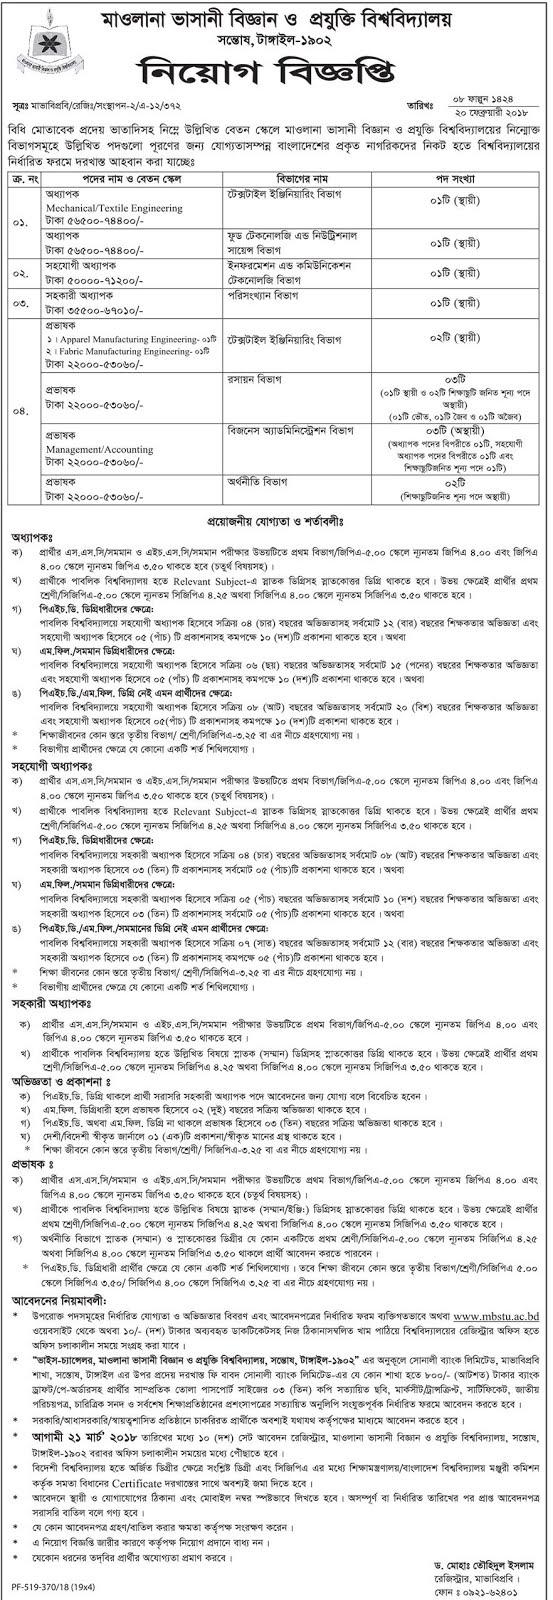 Mawlana Bhashani Science & Technology University Job Circular 2018 1